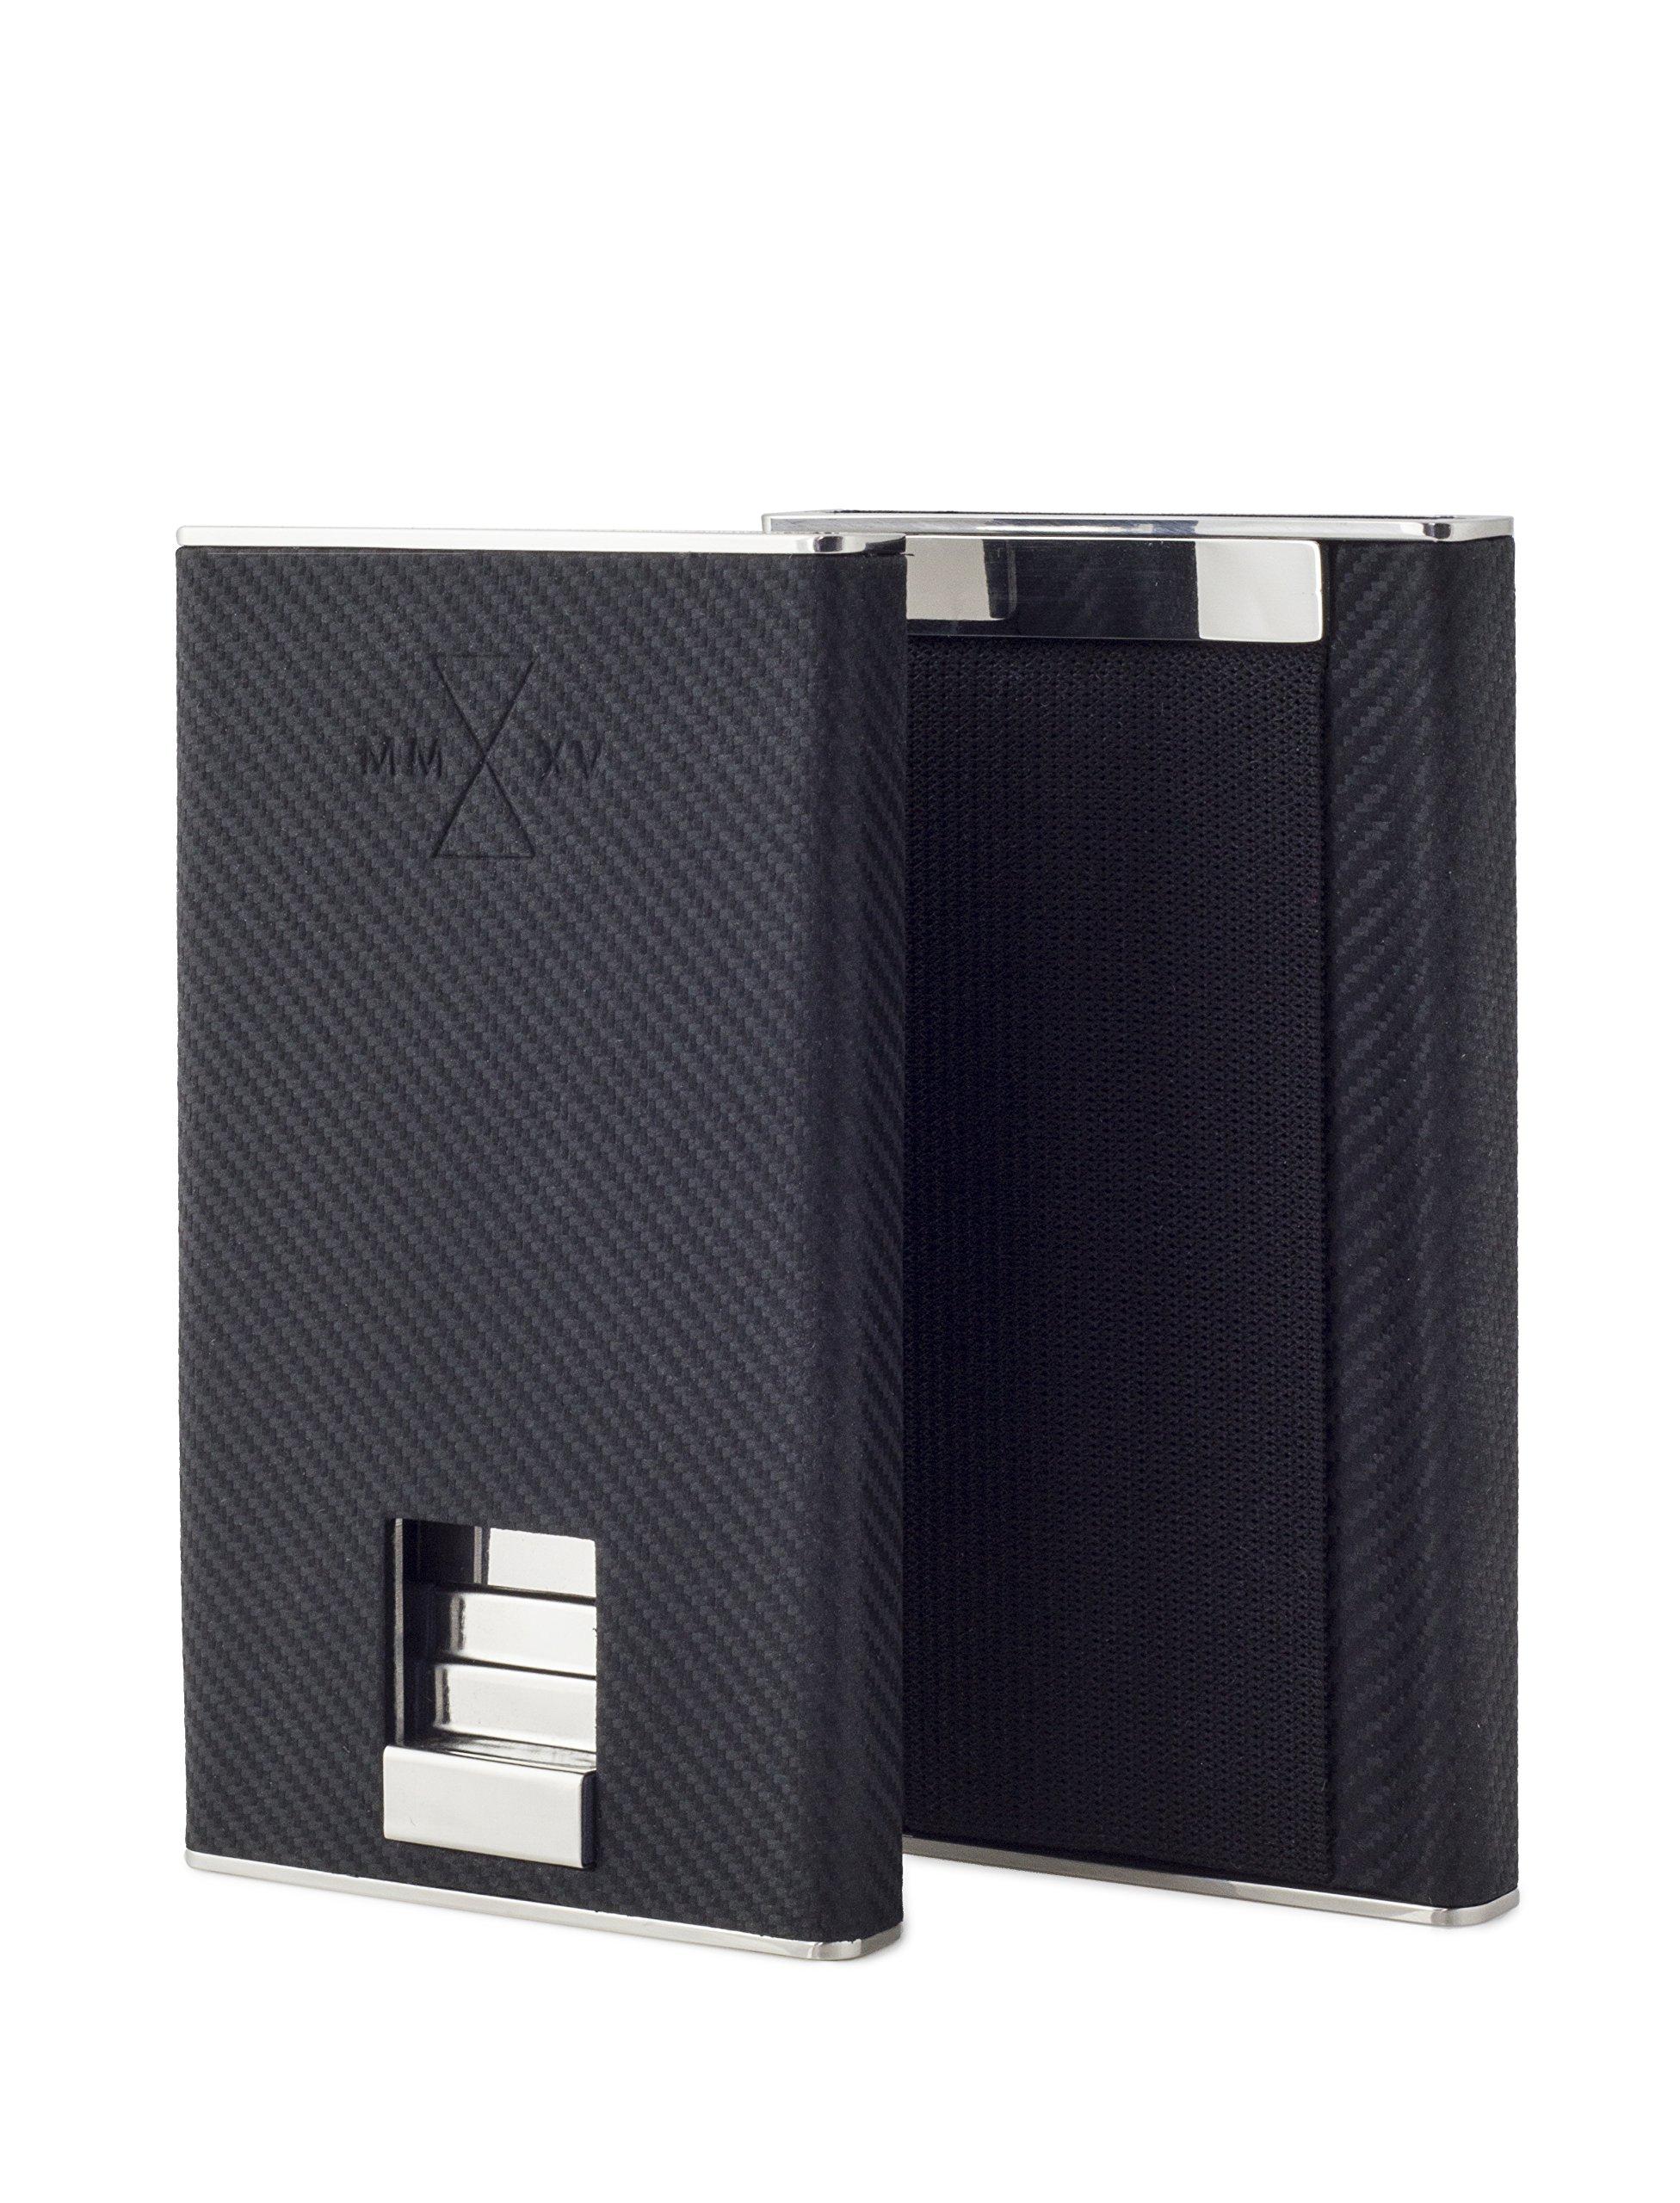 CARBON EVO MINIMAL WALLET (Mach Carbon Leather)